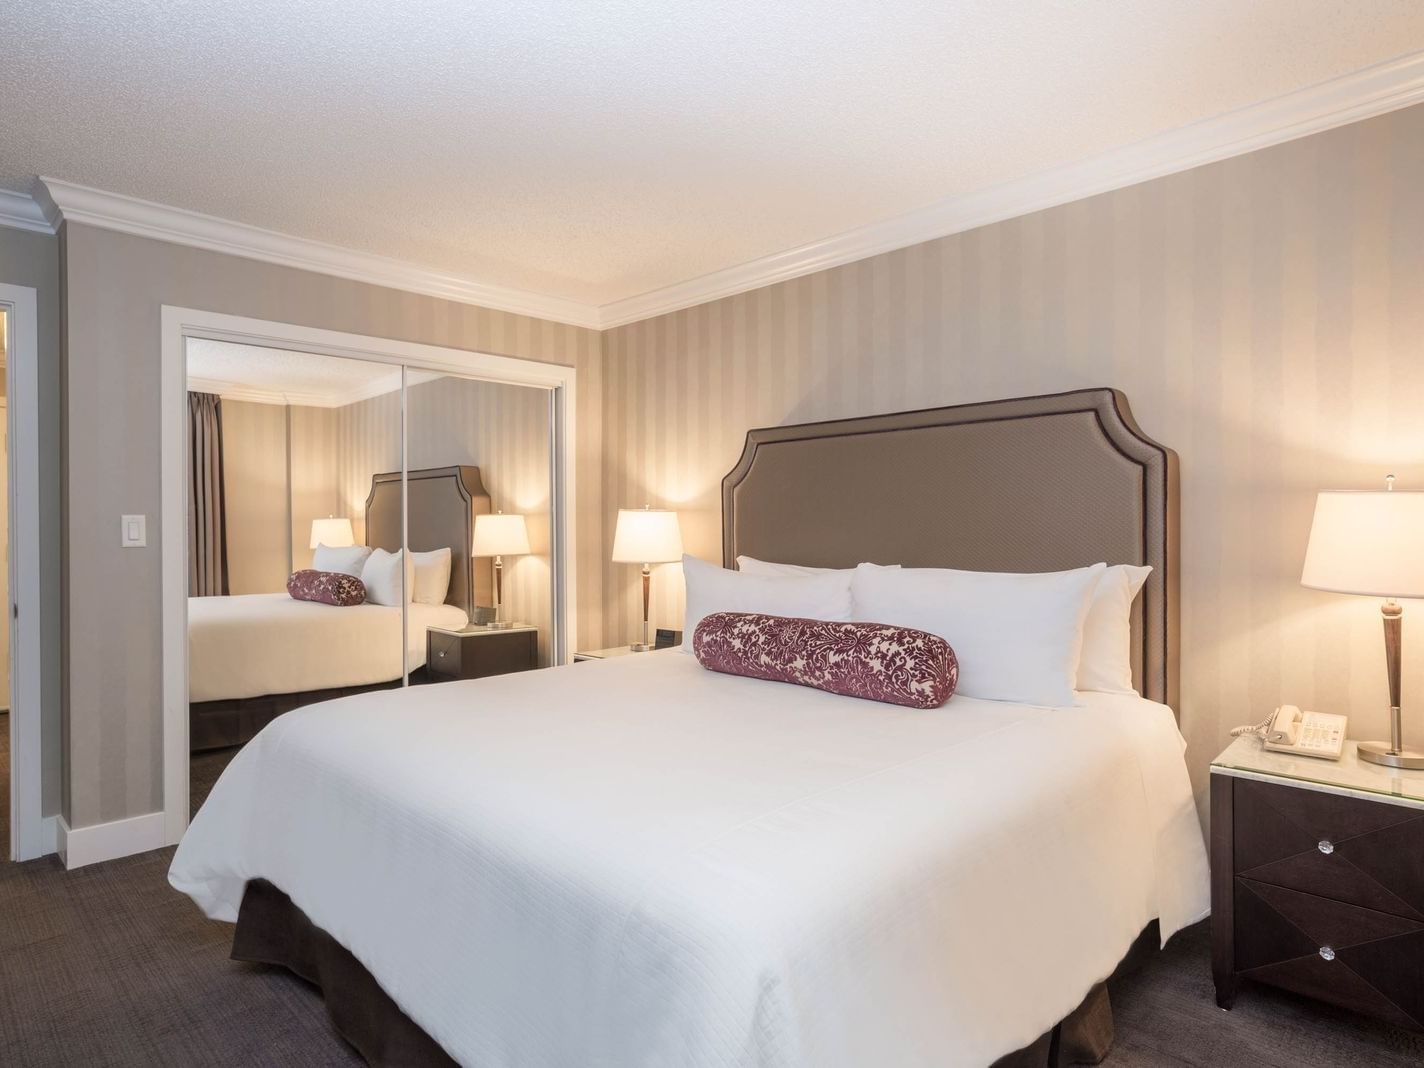 One BedroomSutton Suite - 1 King Bed La Grande Résidence